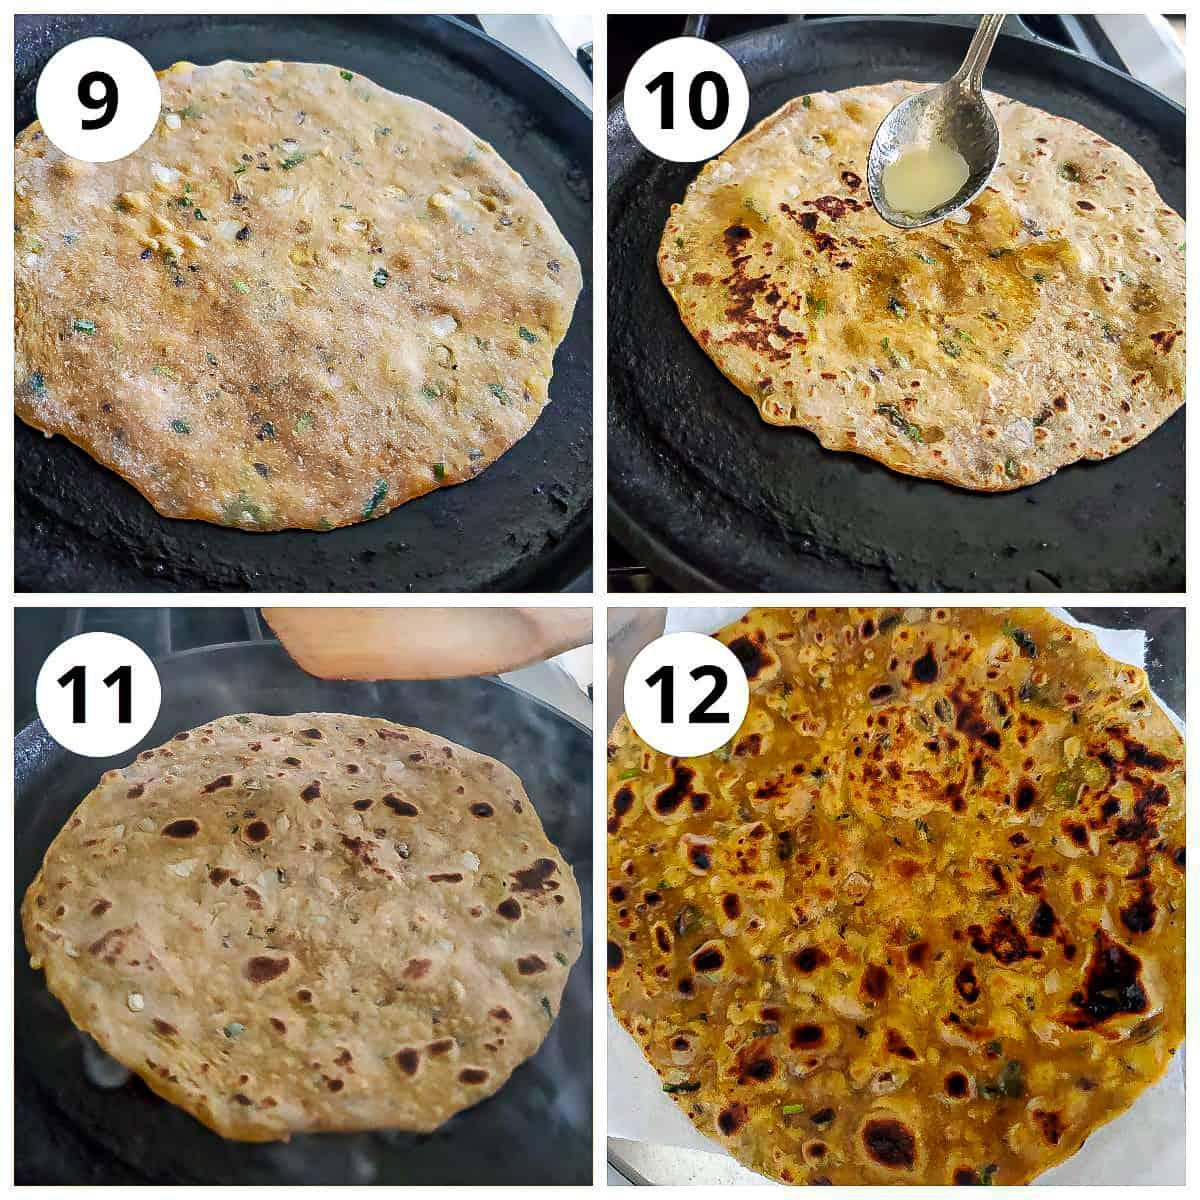 Steps for roasting dal paratha